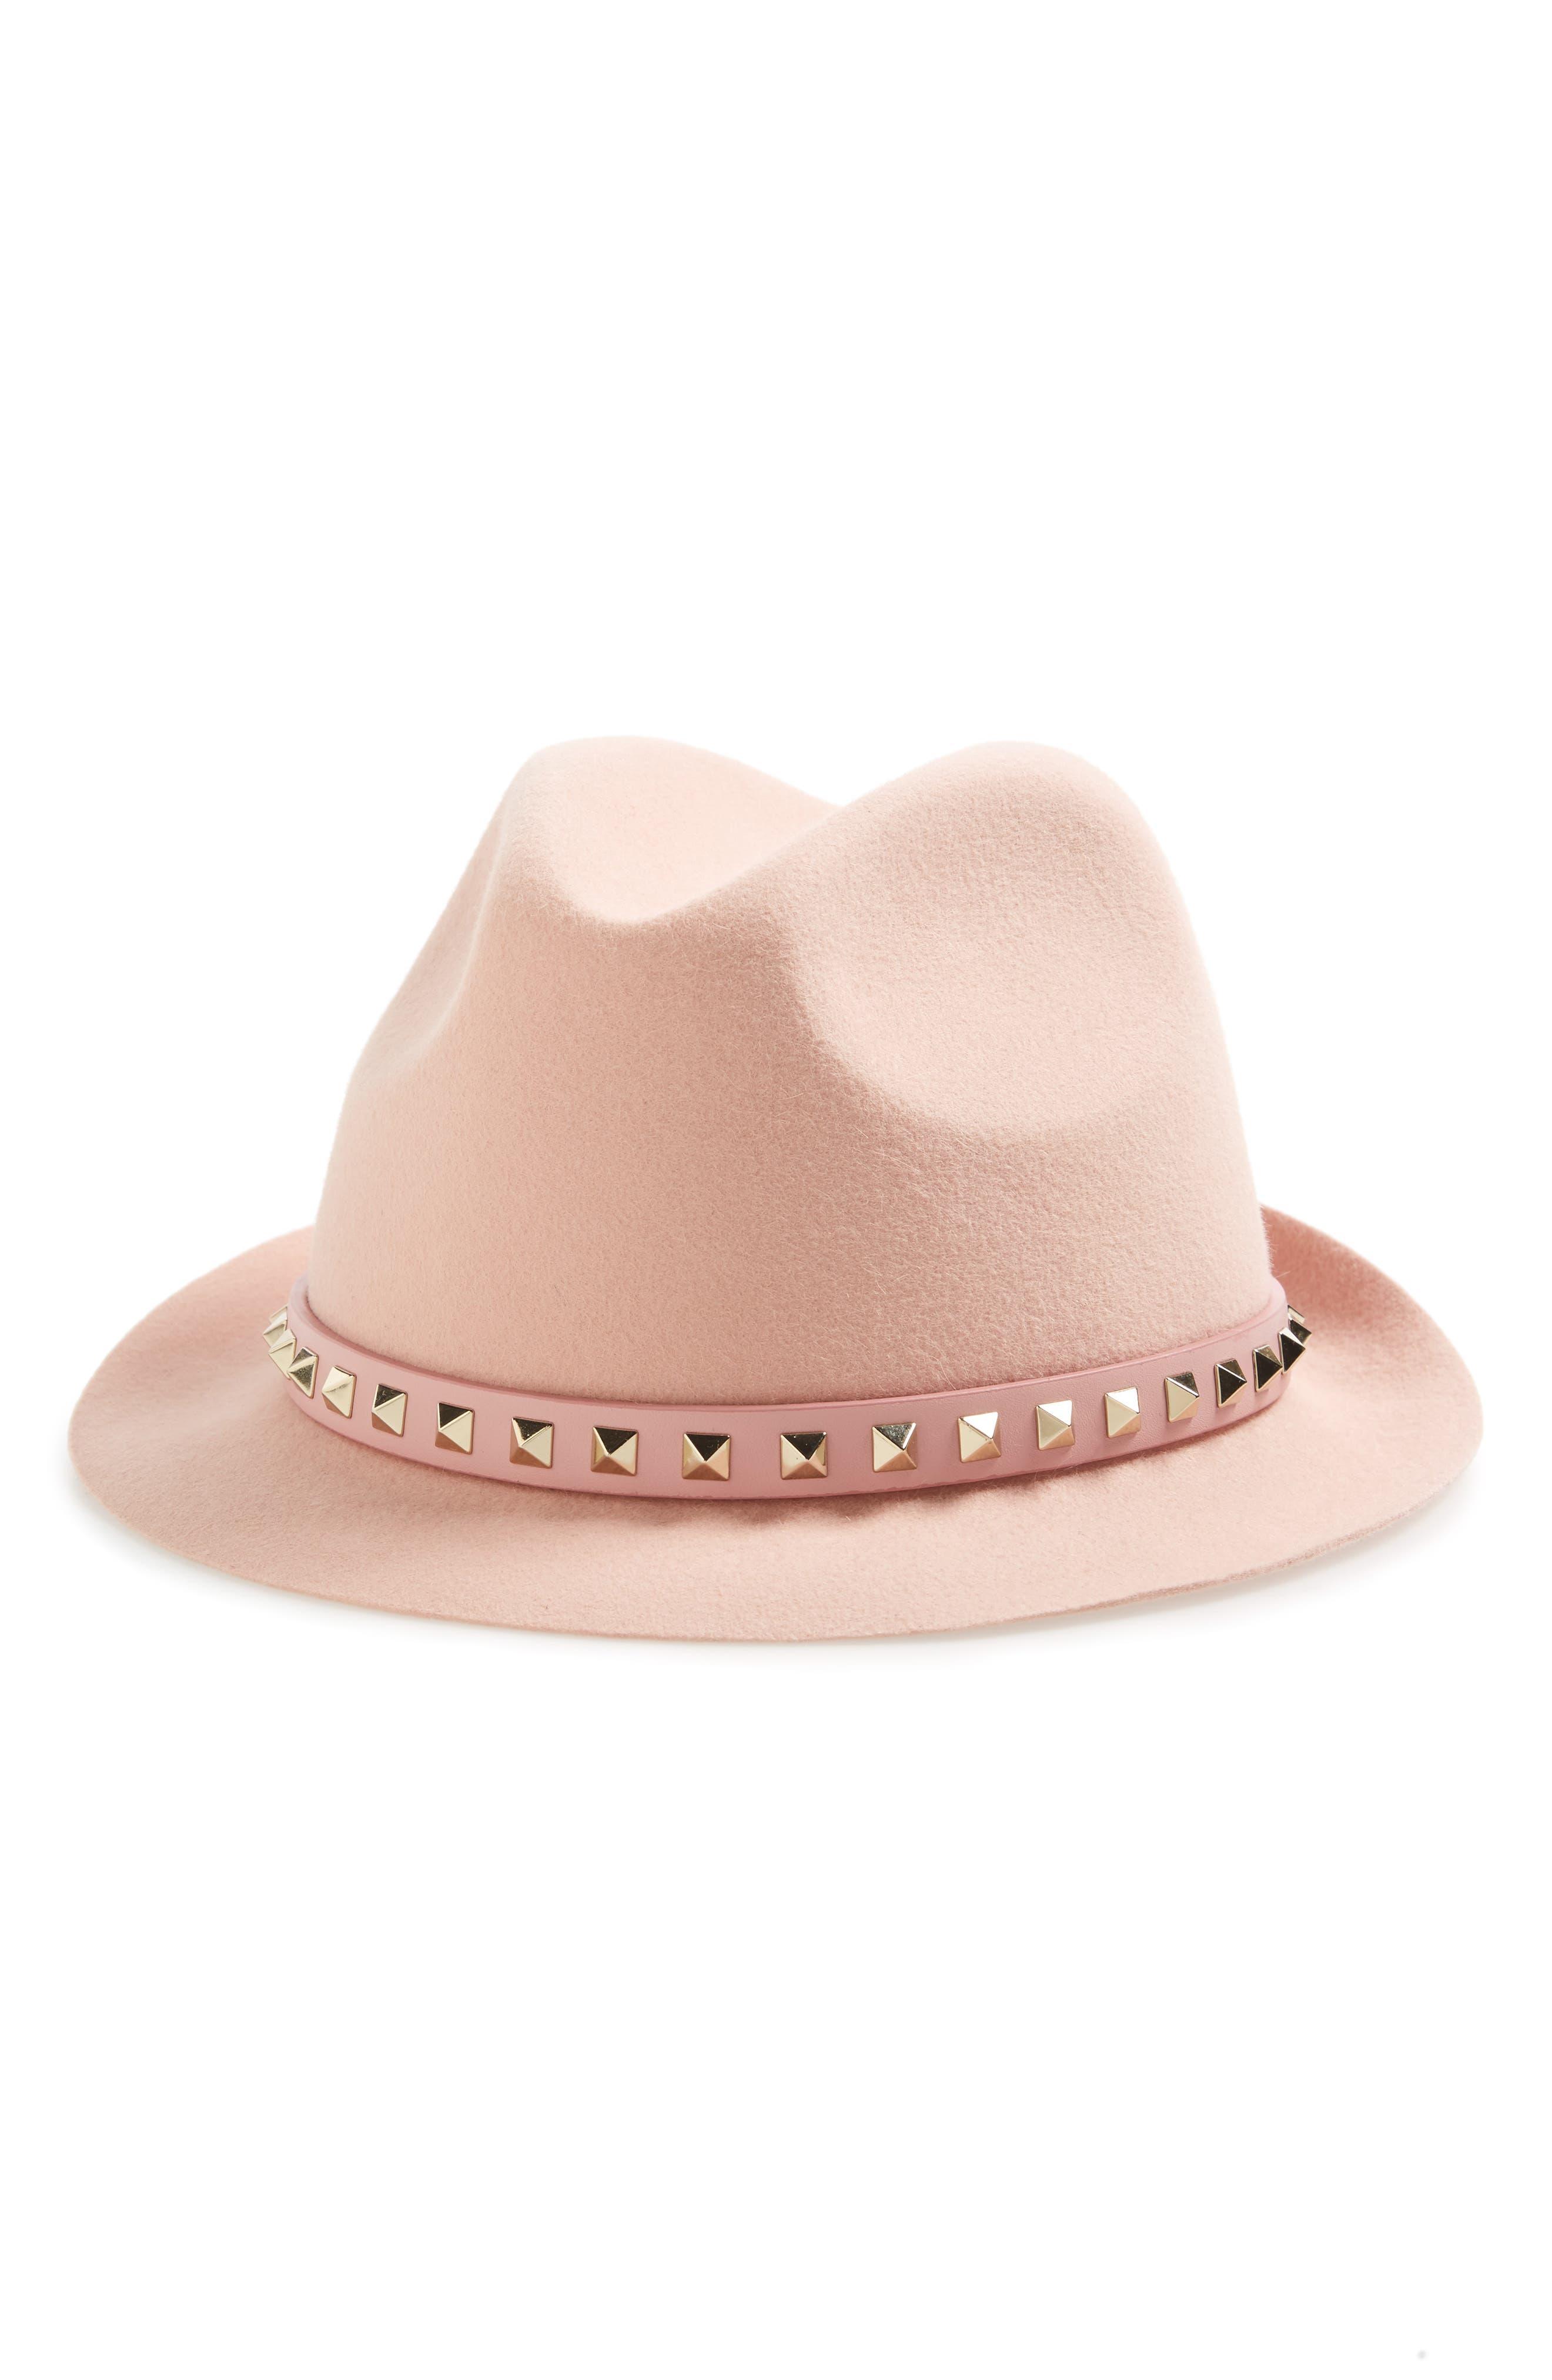 Fur Felt Hat,                         Main,                         color, LOTO/ LOT